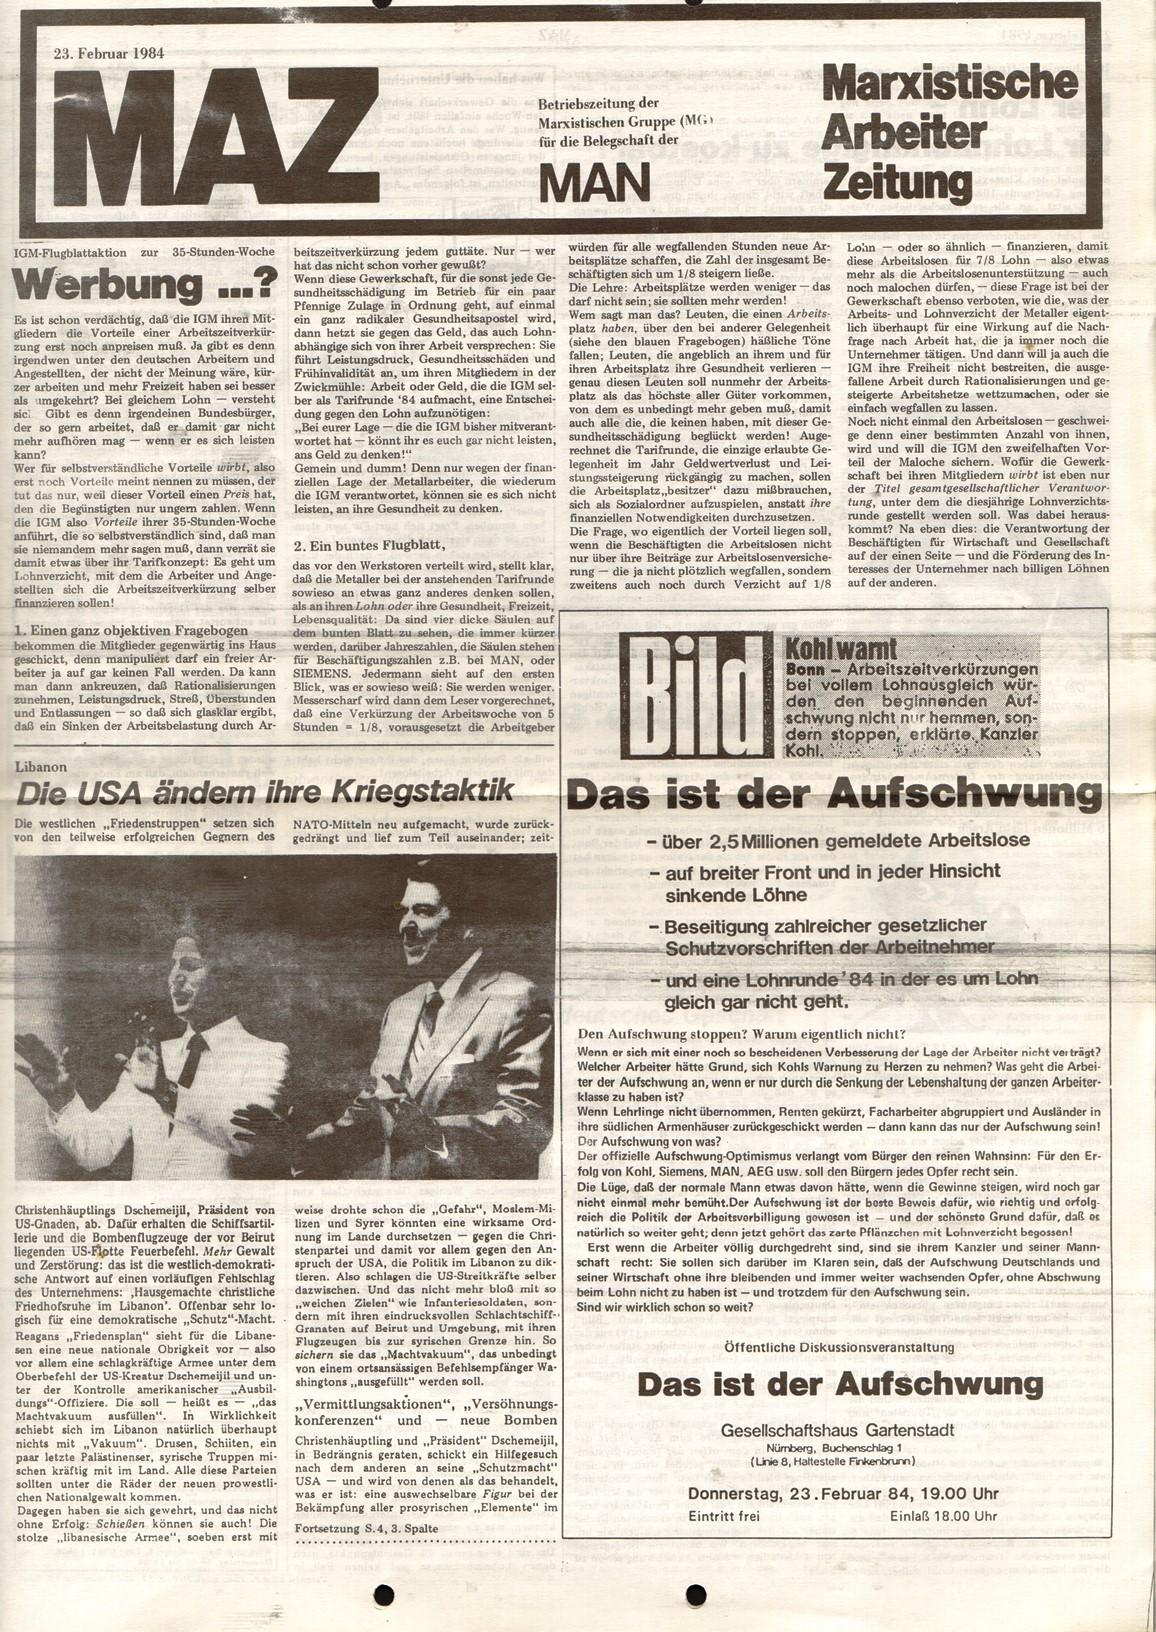 Nuernberg_MG_MAZ_MAN_19840223_01